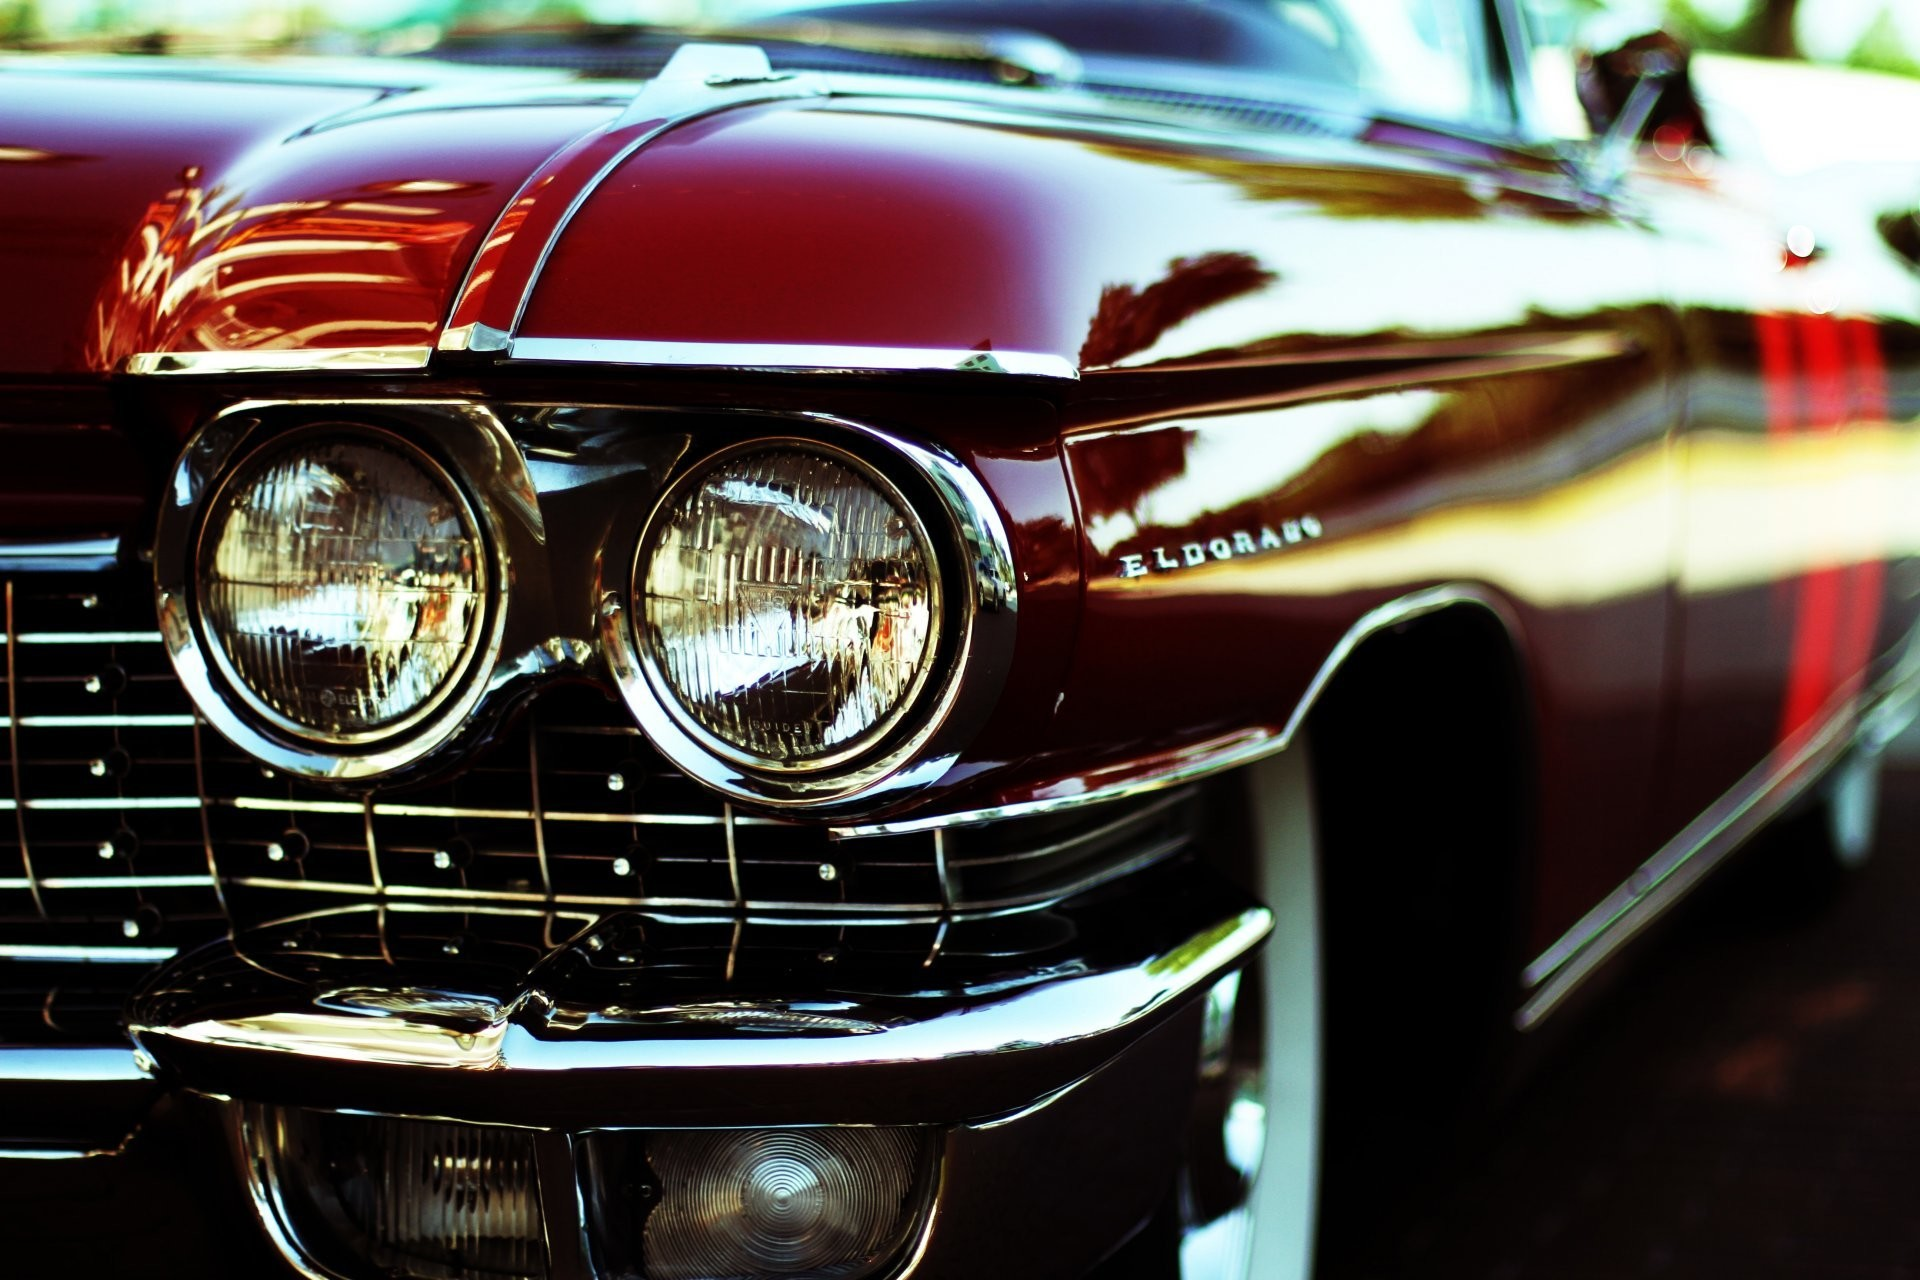 Old School Cars Wallpaper ·① WallpaperTag